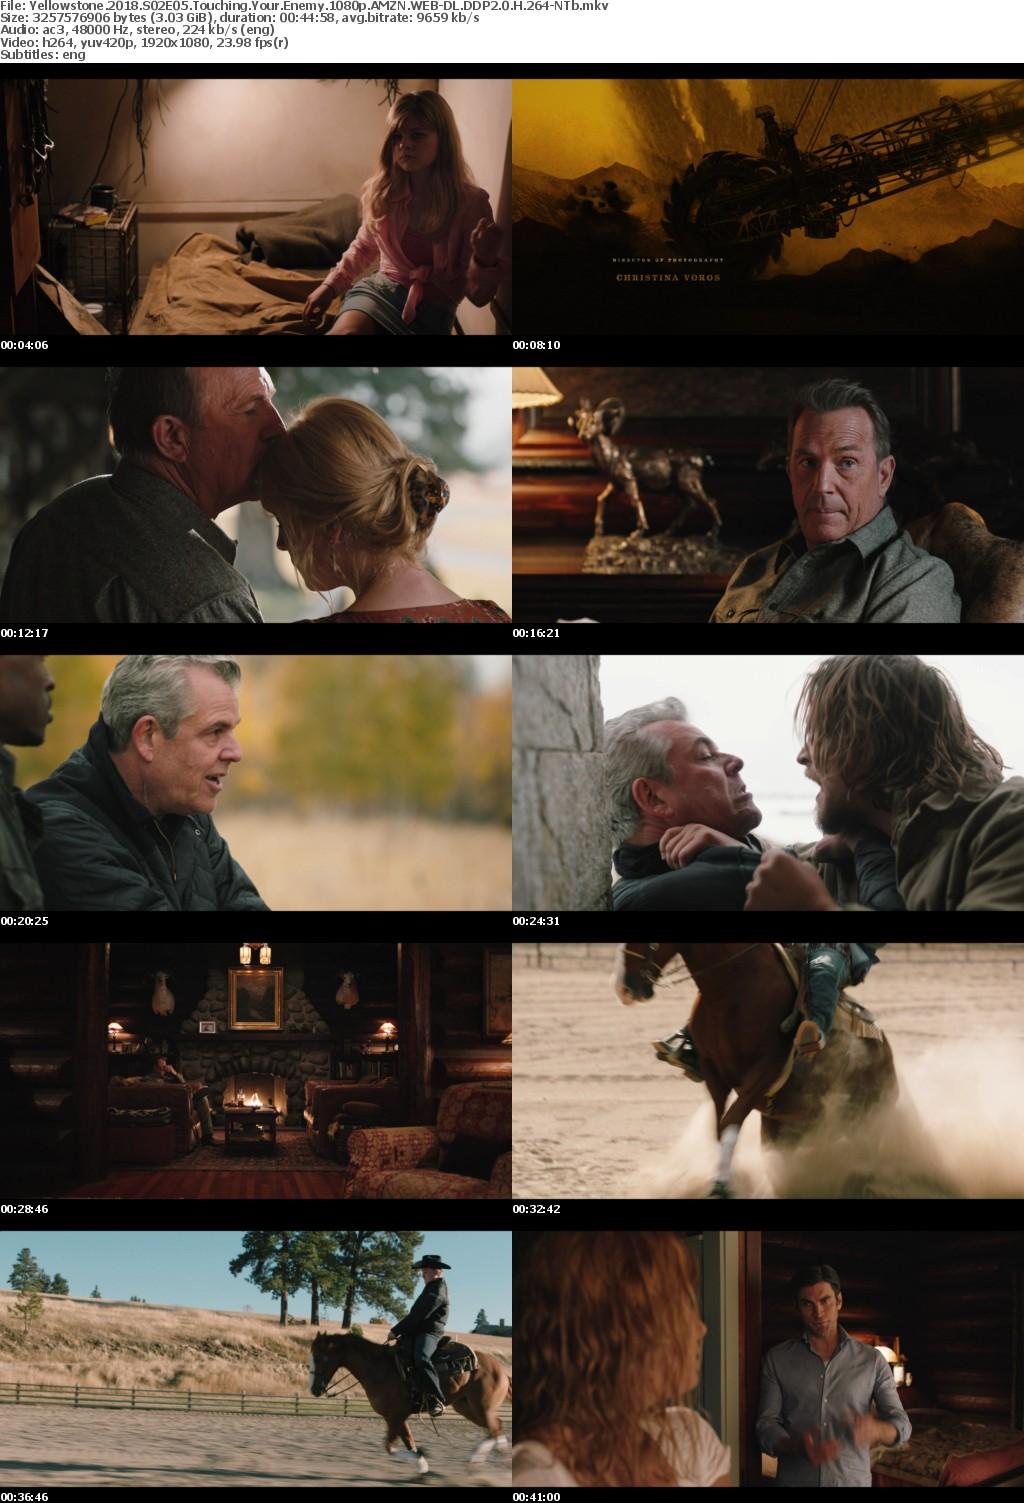 Yellowstone 2018 S02E05 Touching Your Enemy 1080p AMZN WEB-DL DDP2 0 H 264-NTb